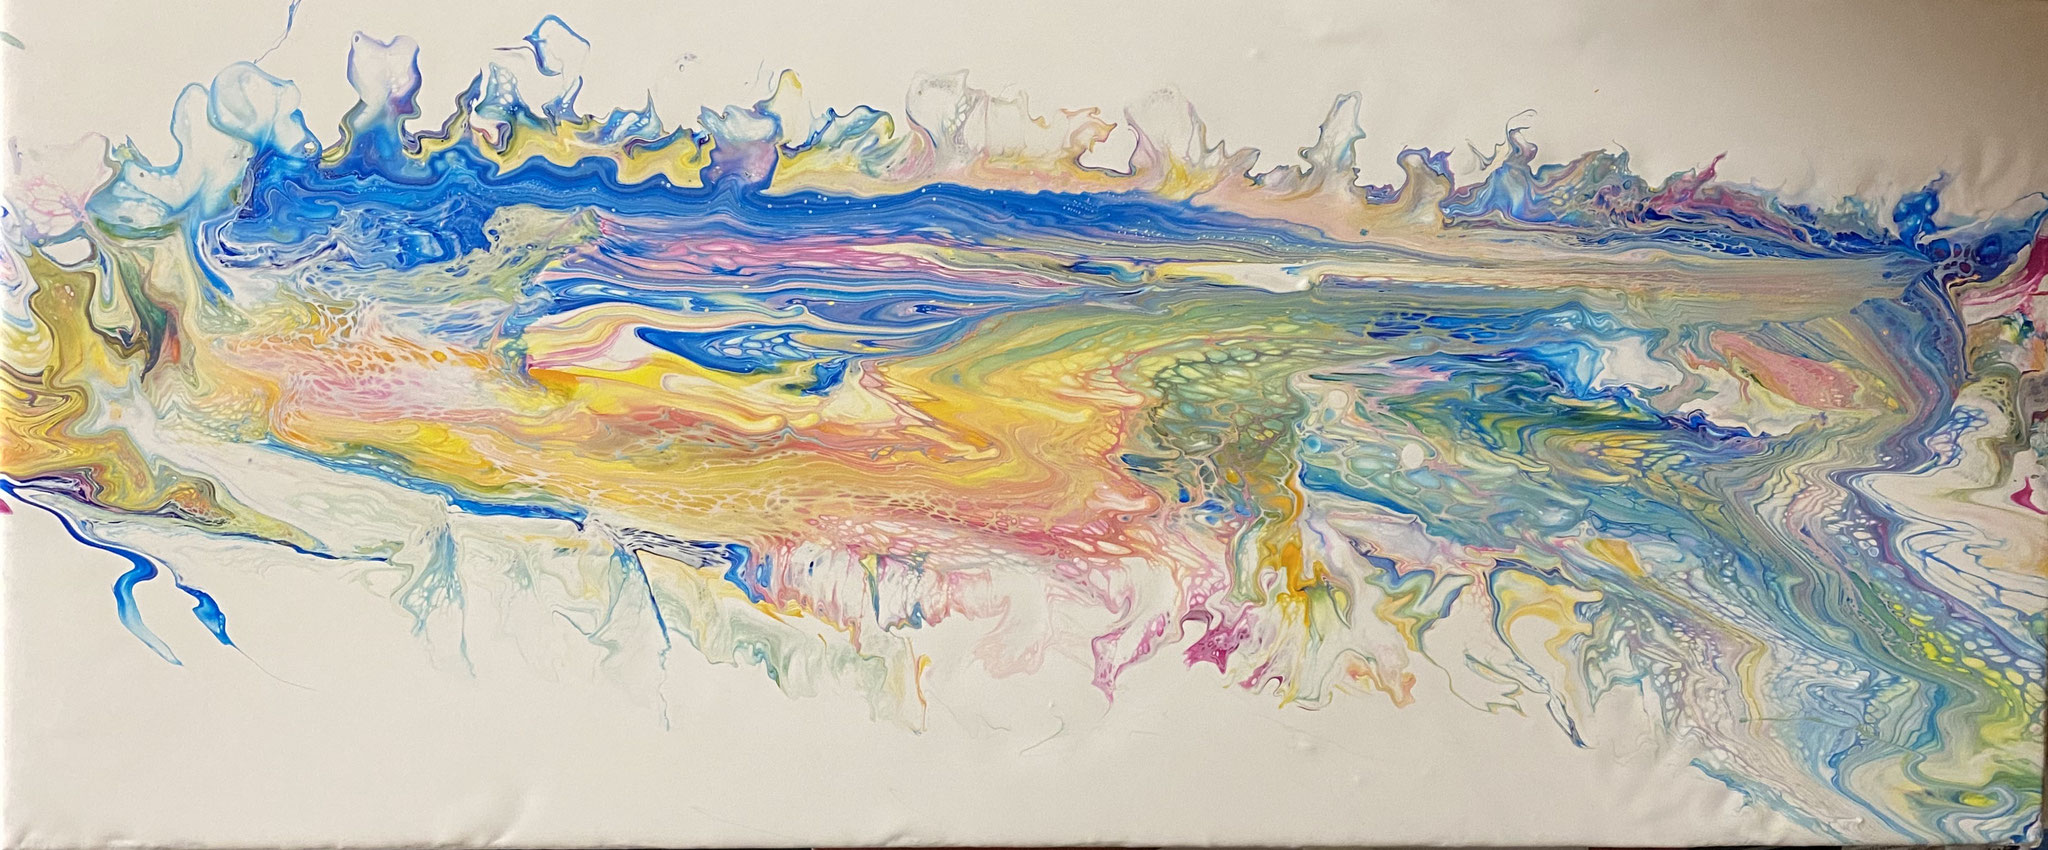 NR.6 Streched Canvas Rainbow